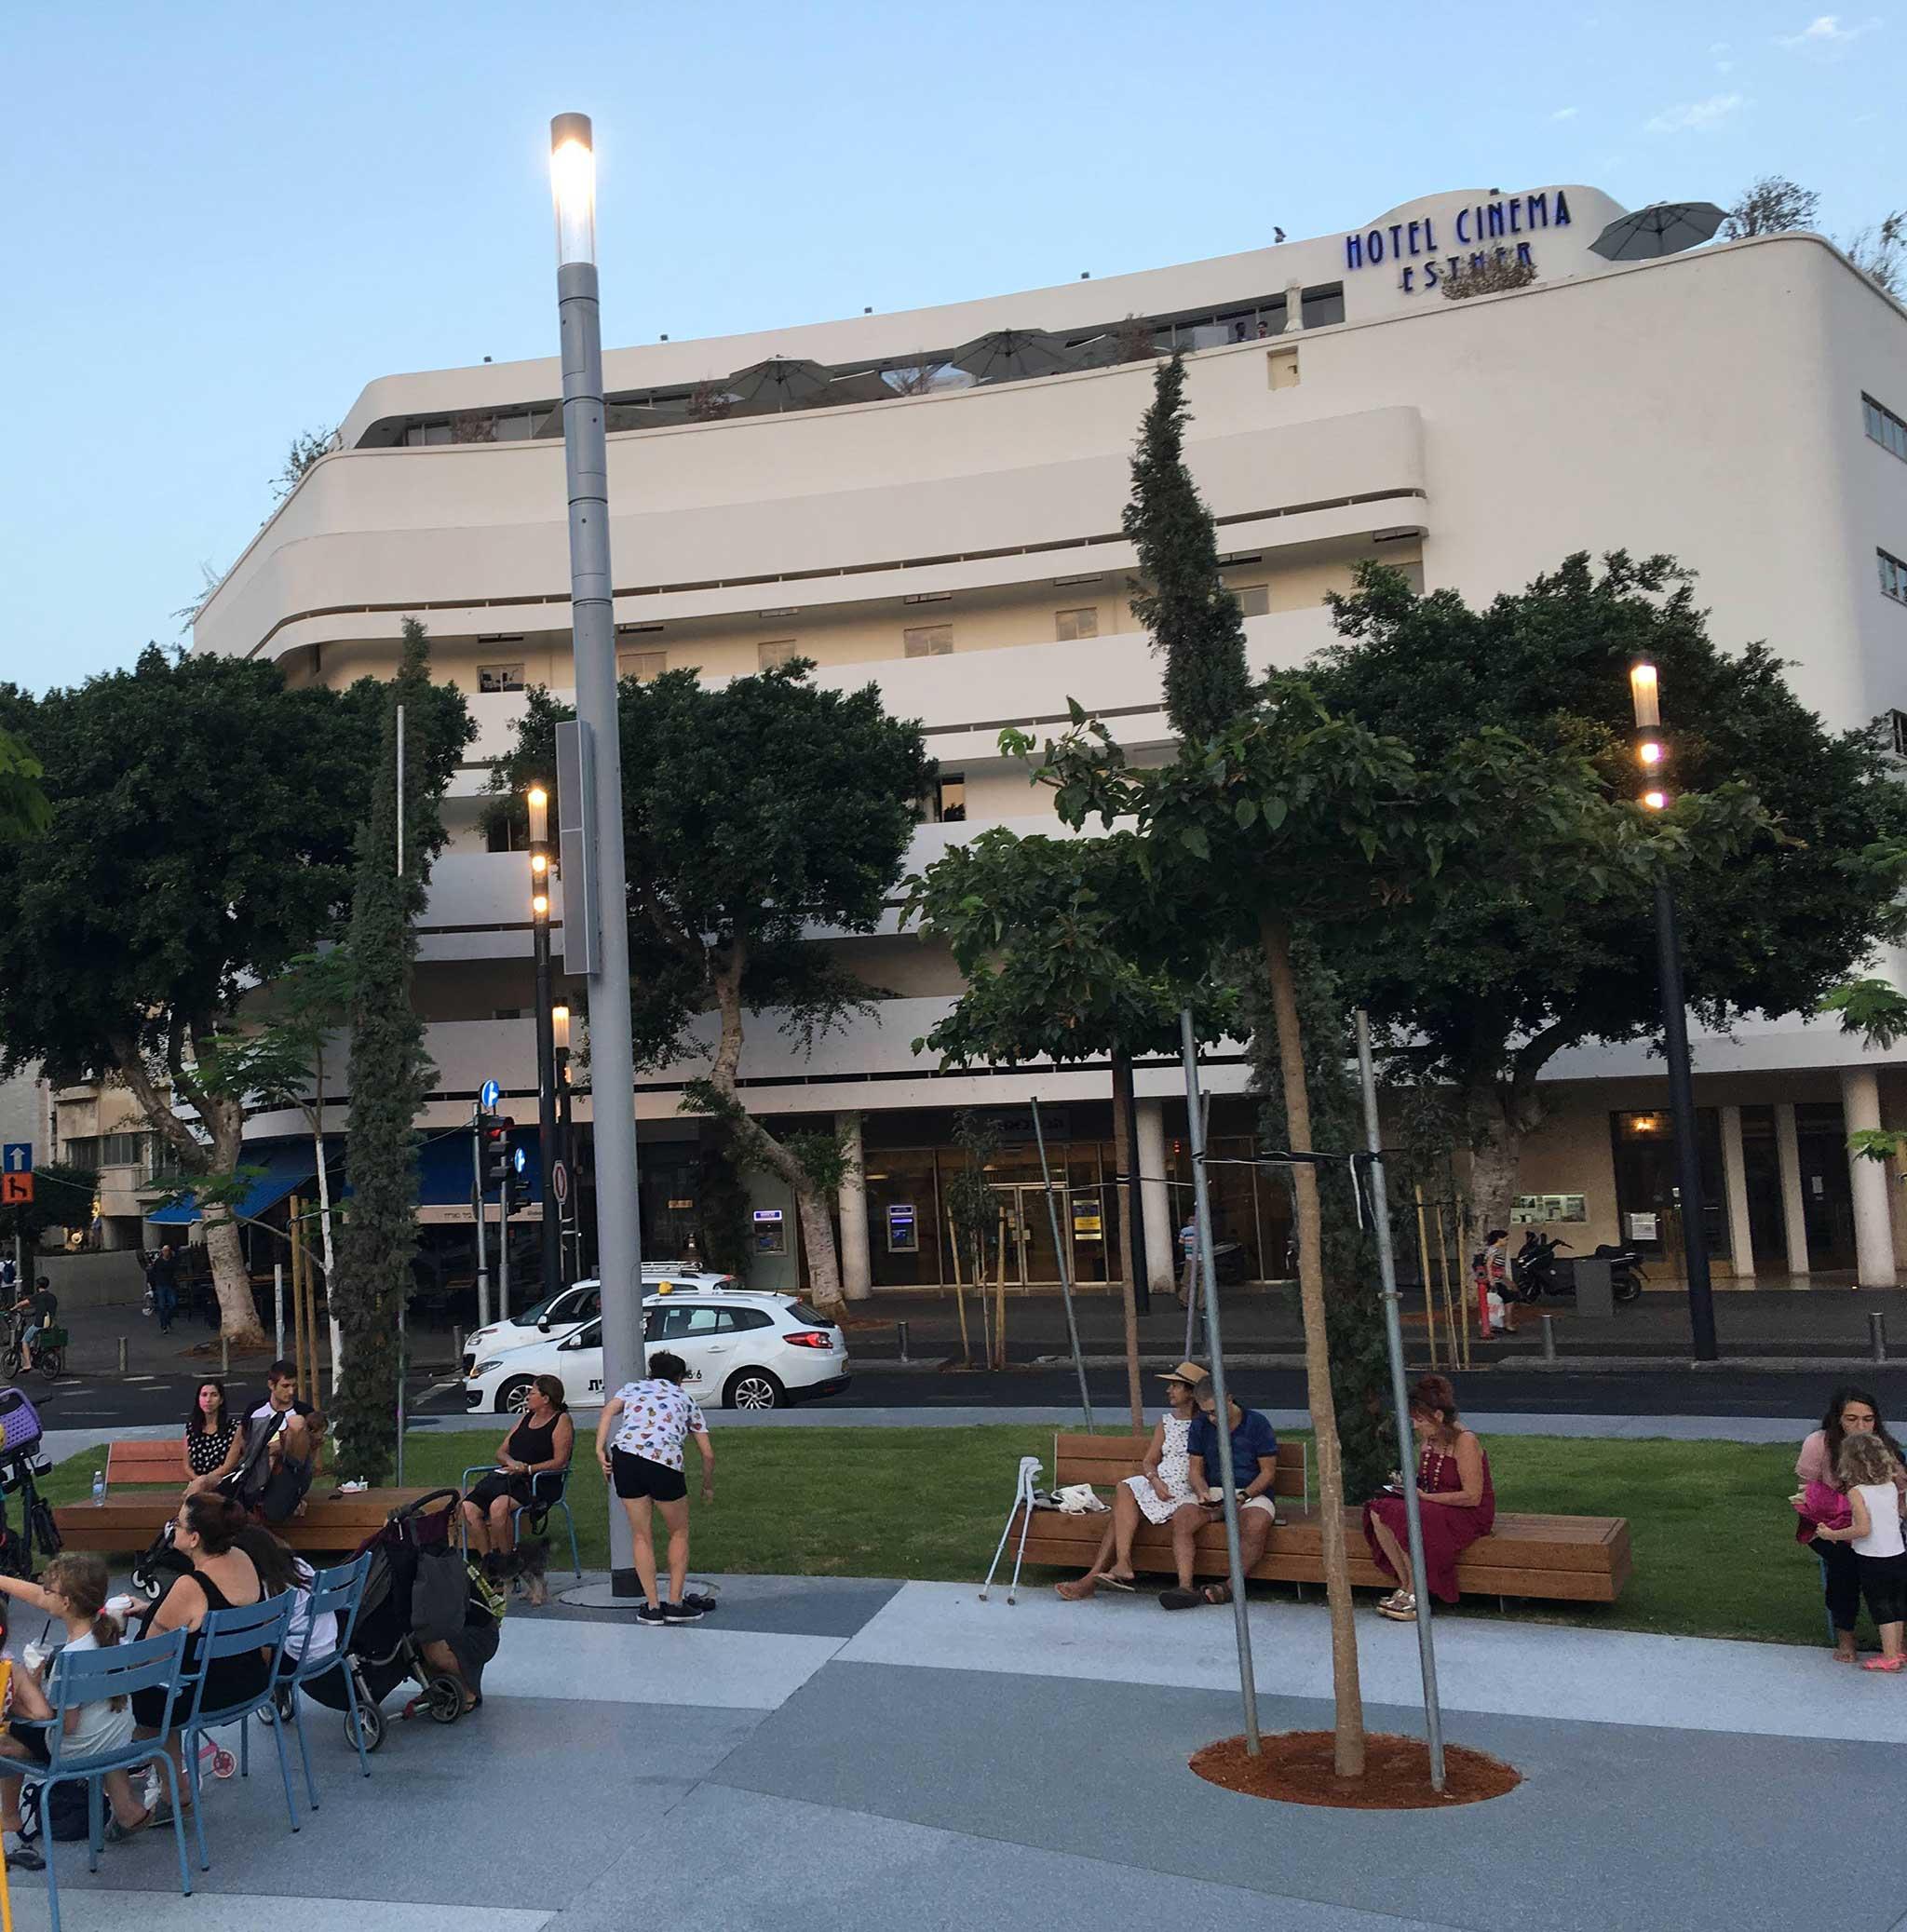 Hotel Cinema on Tel Aviv audio tour The White City